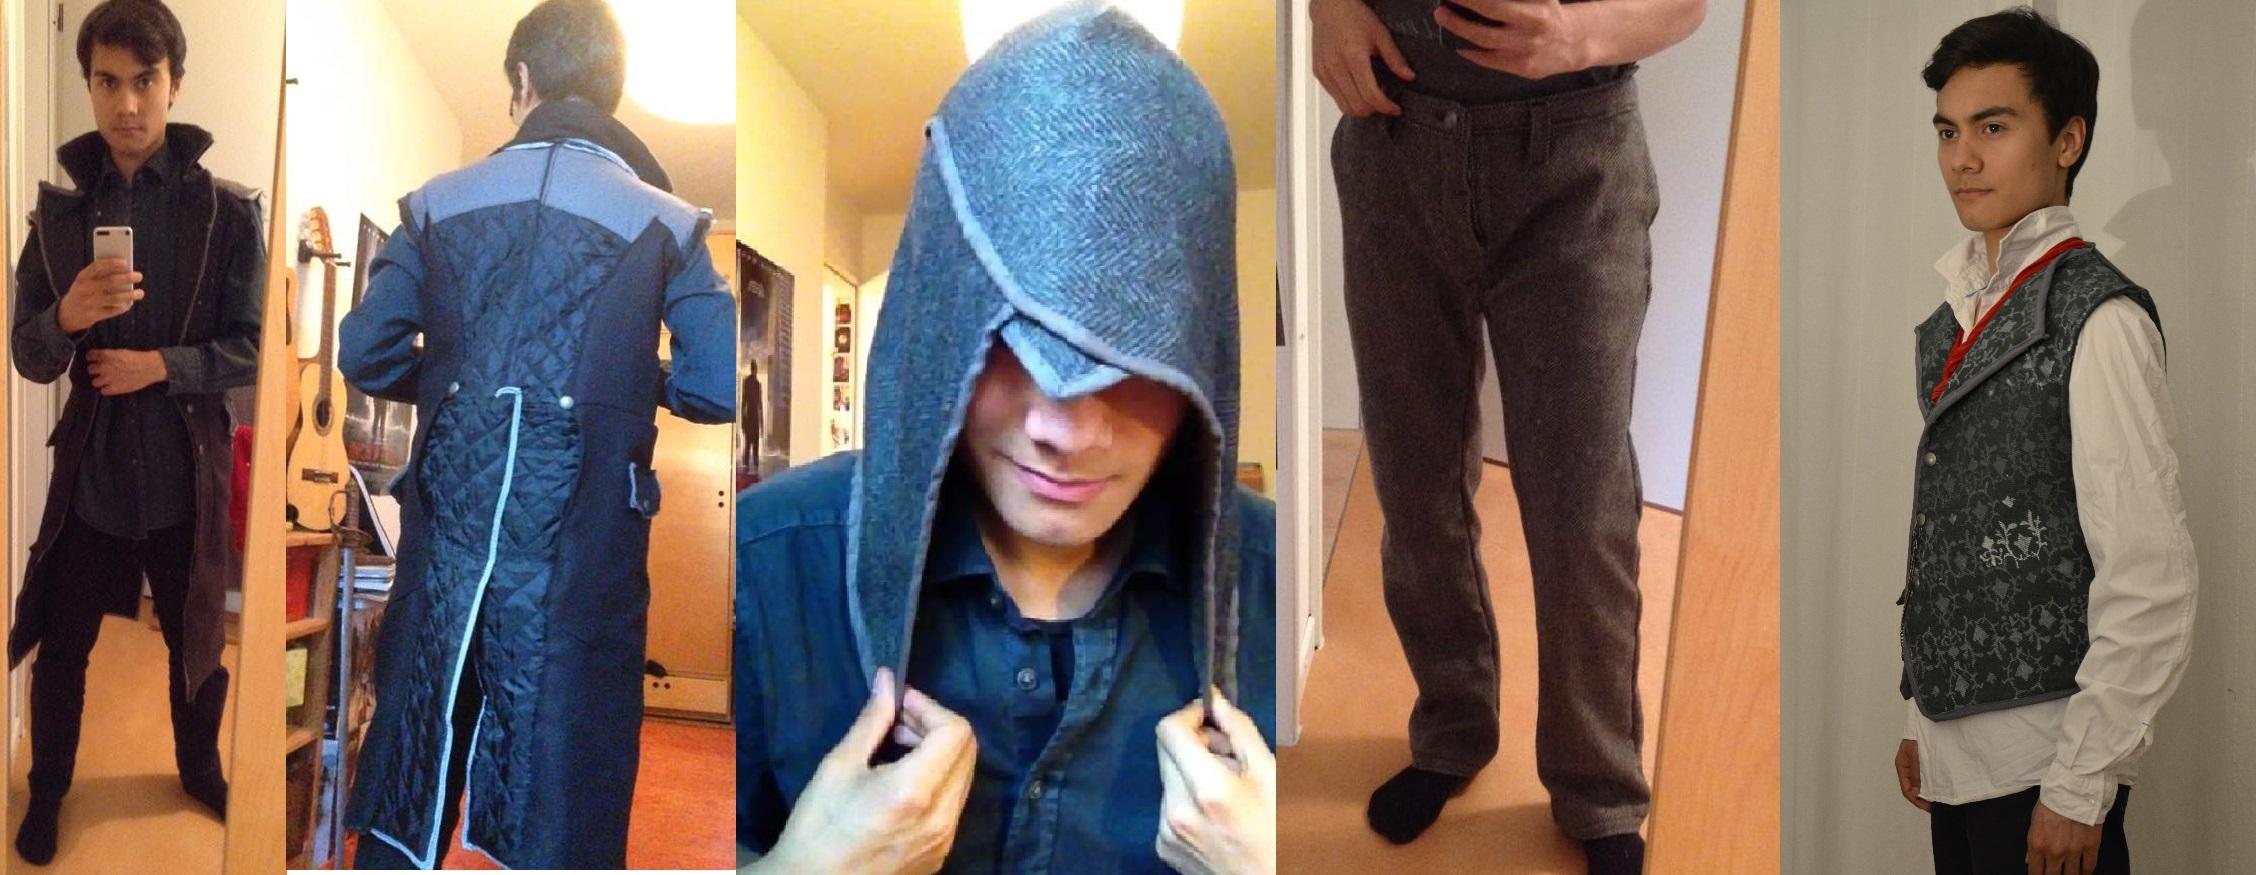 Jacob Frye Cosplay Wip Assassins Creed Syndicate By Kadart